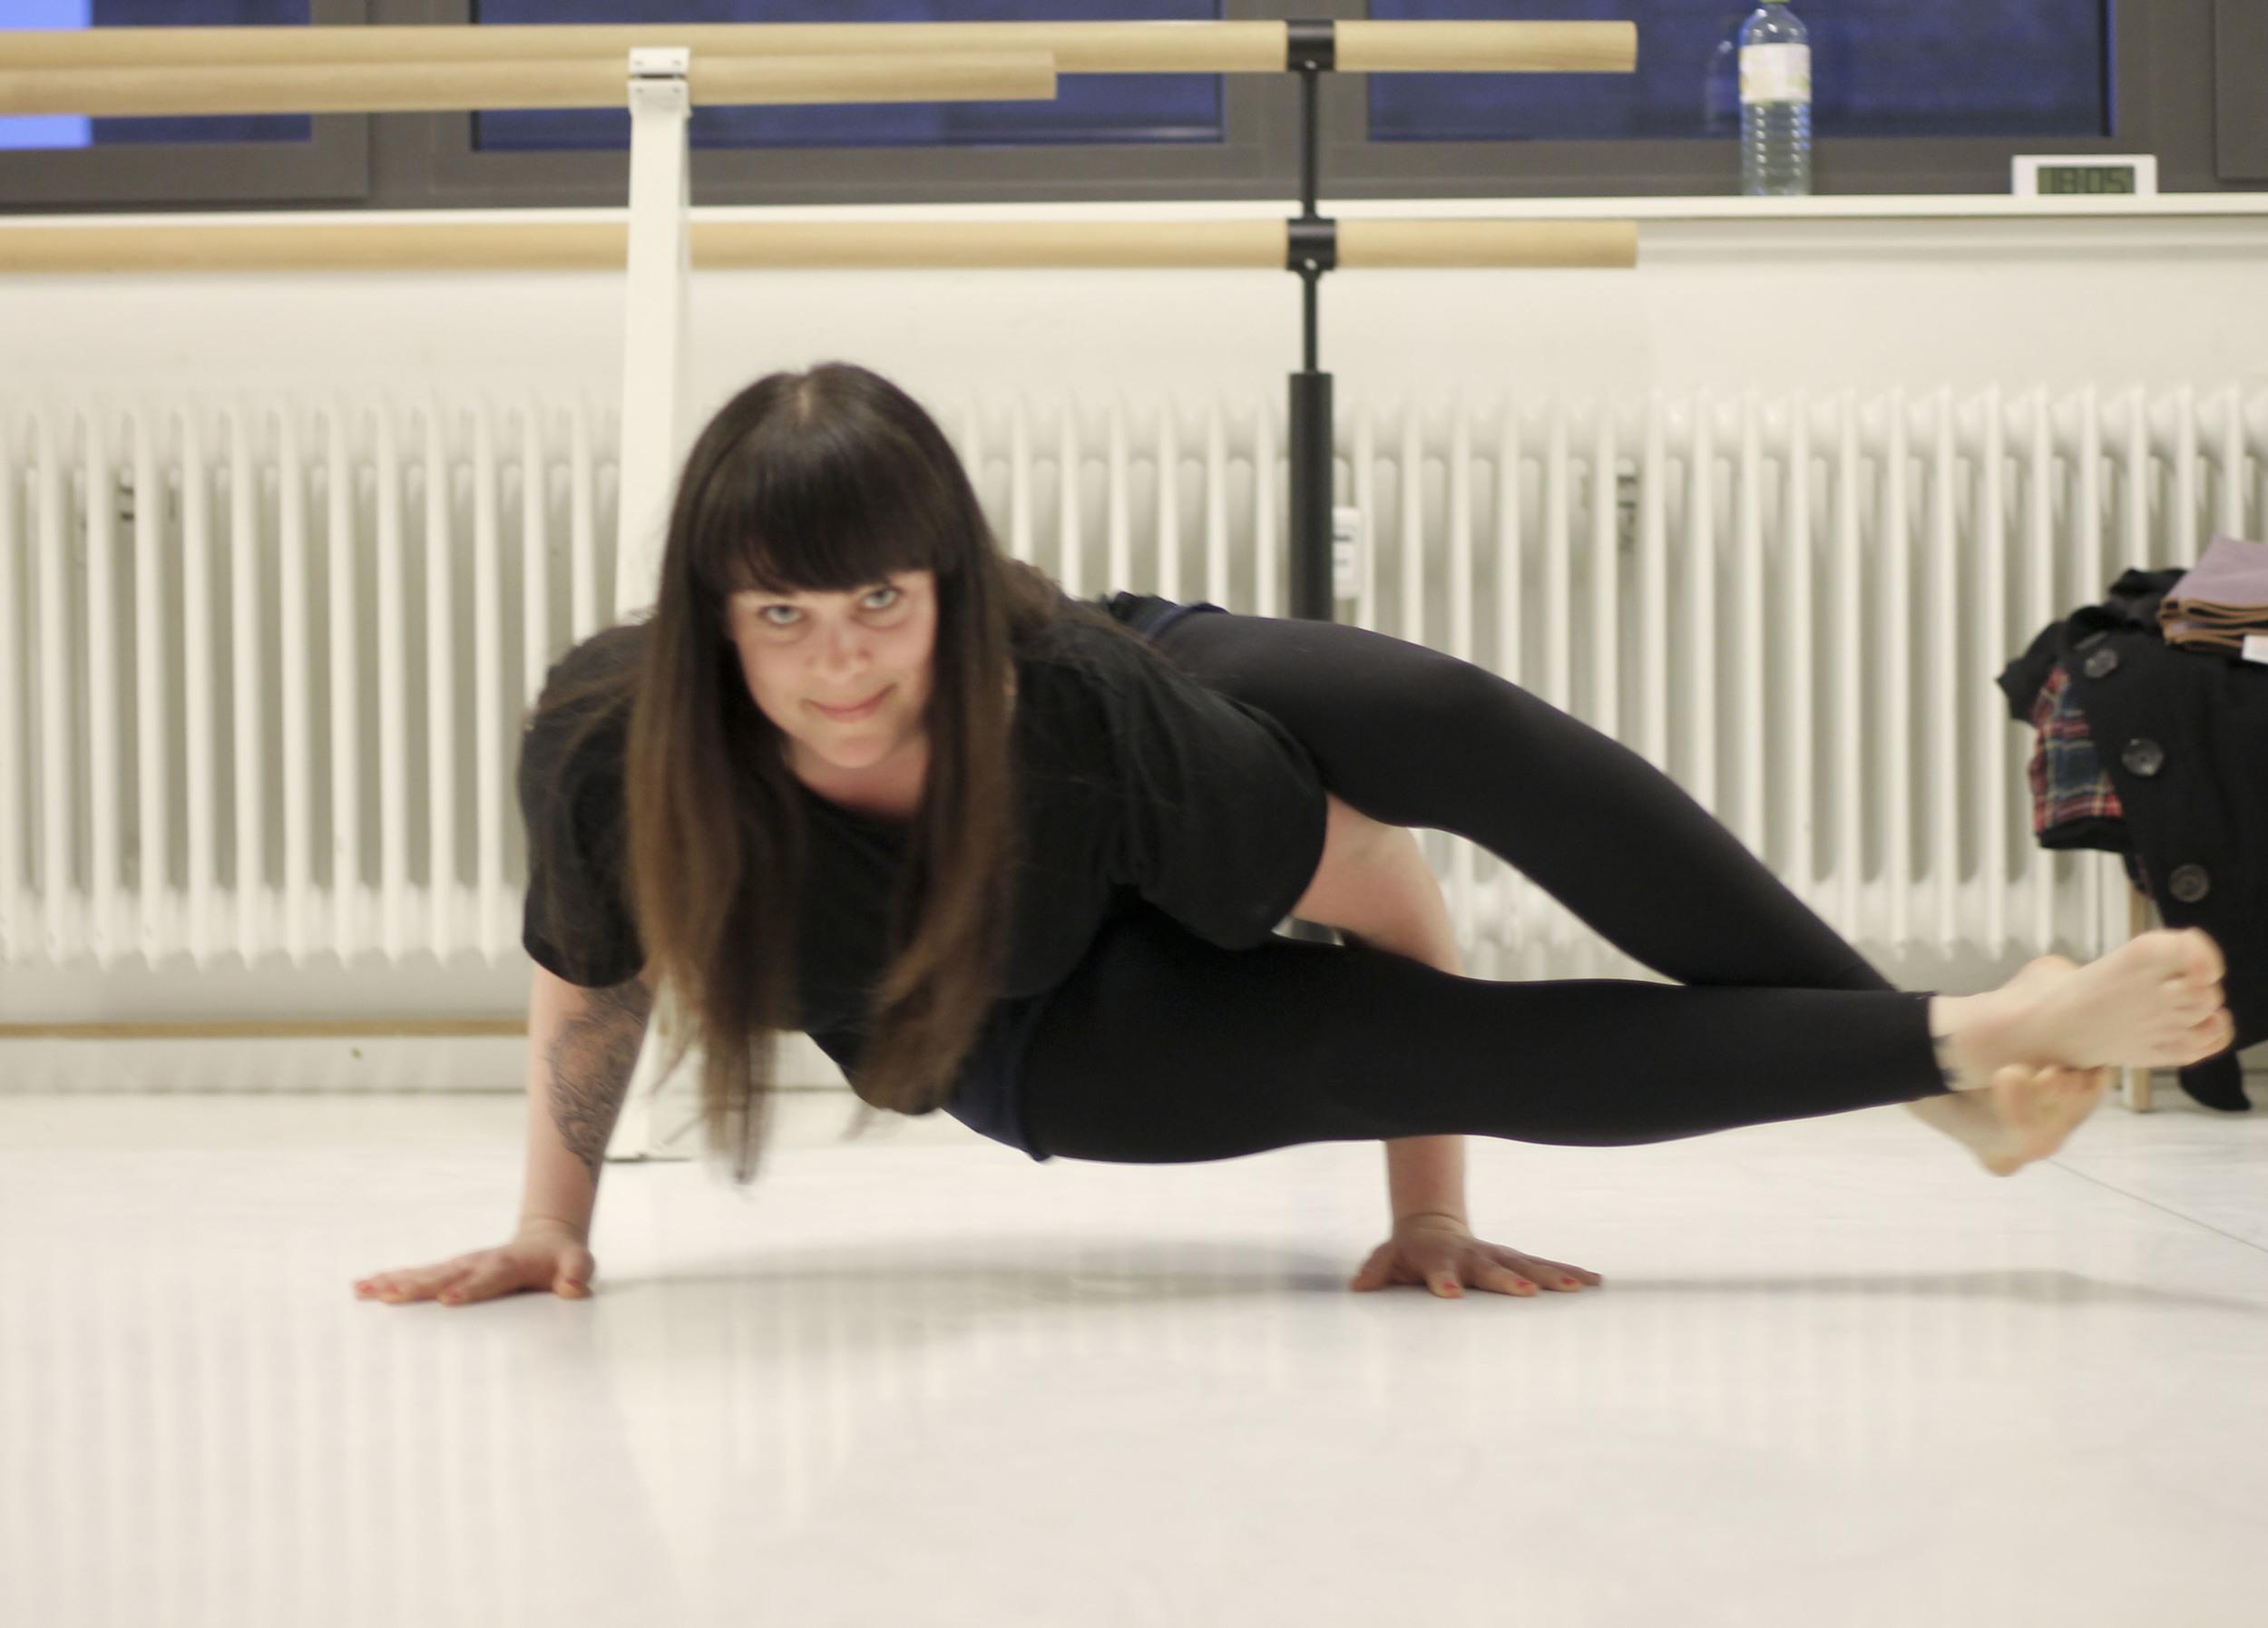 hip hop yoga berlin kreuzberg motions1361.jpg